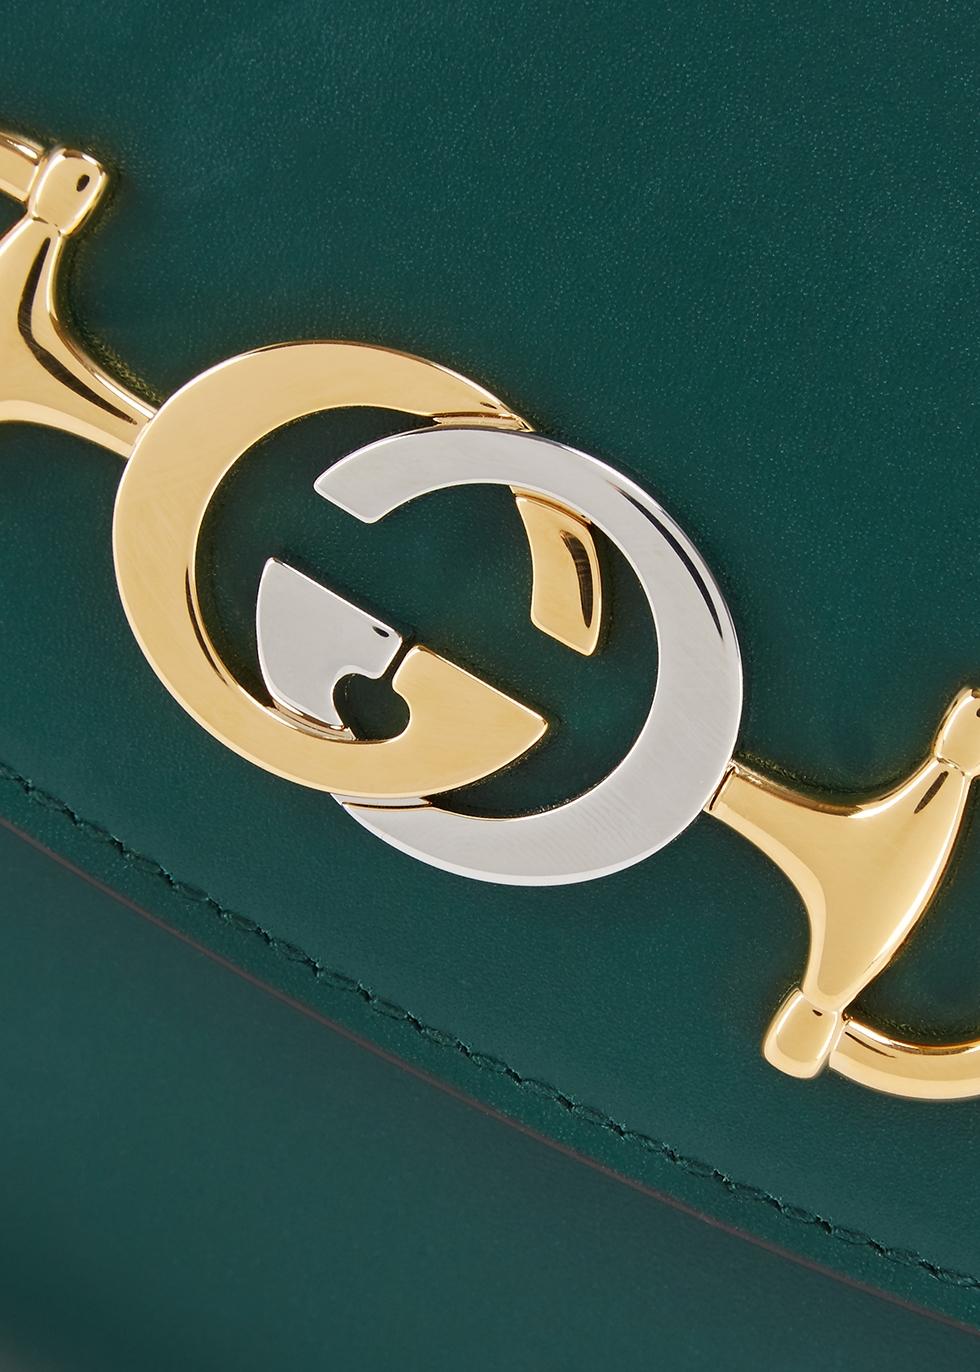 Zumi small leather shoulder bag - Gucci